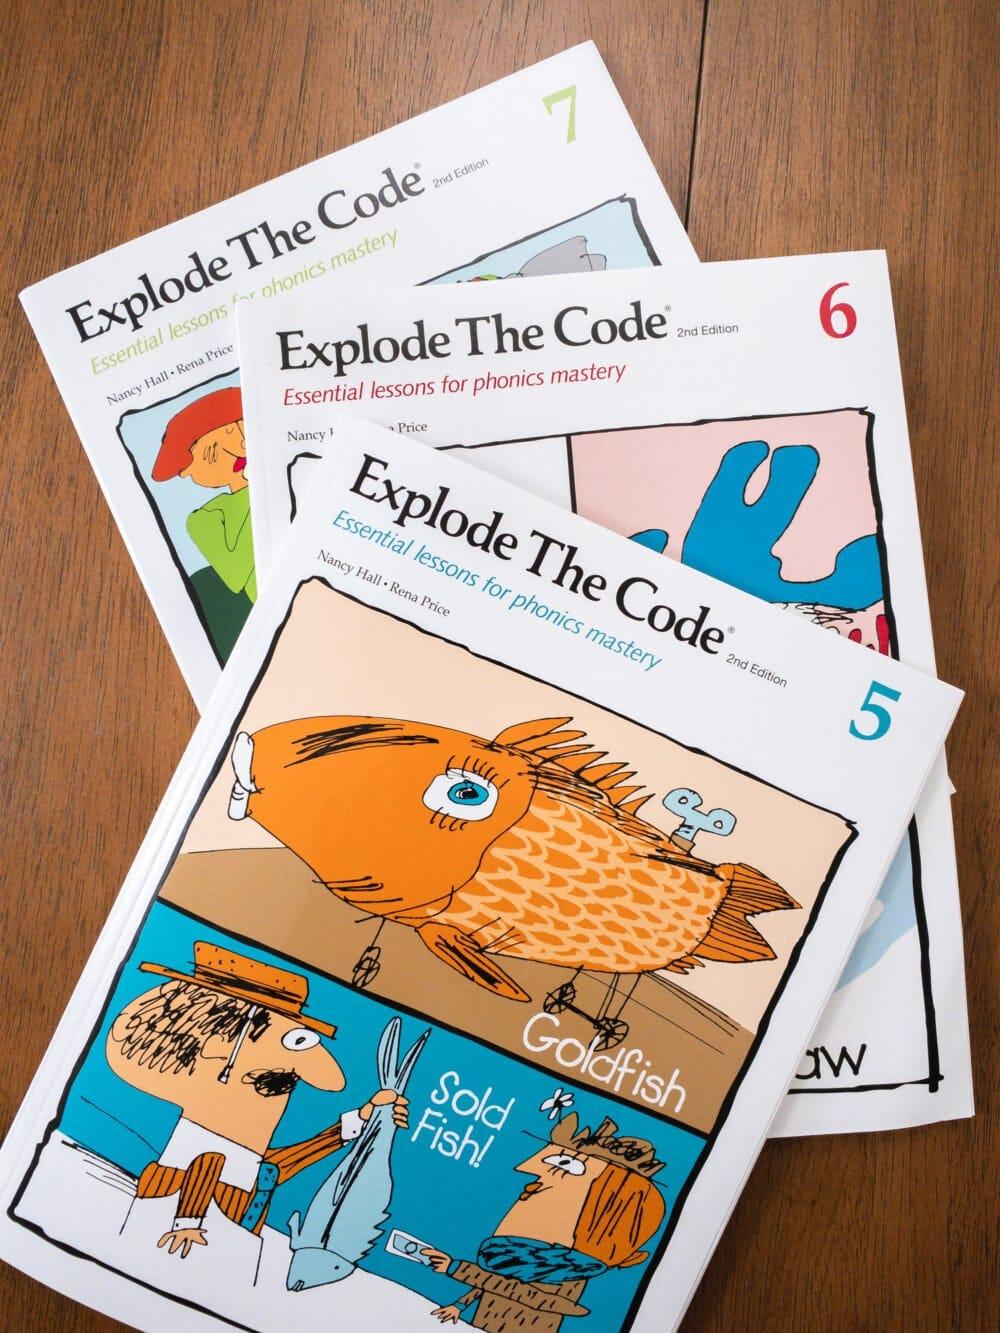 explode the code 4th grade language arts homeschool curriculum sitting on a desk